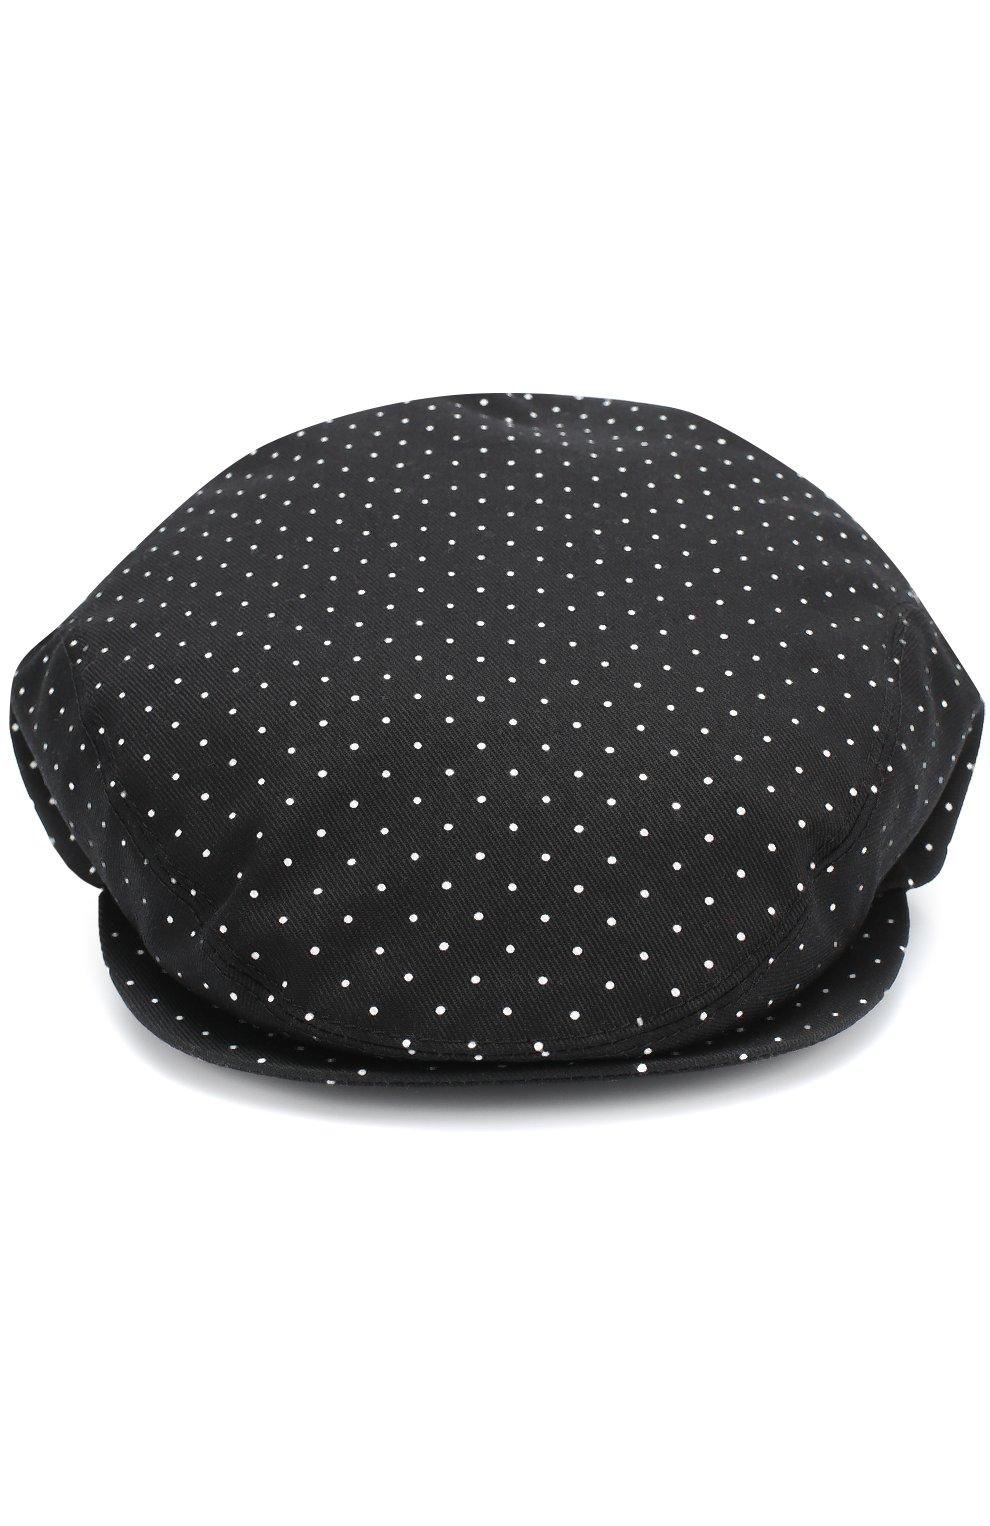 Хлопковое кепи с узором Polka Dot Dolce & Gabbana черного цвета | Фото №3